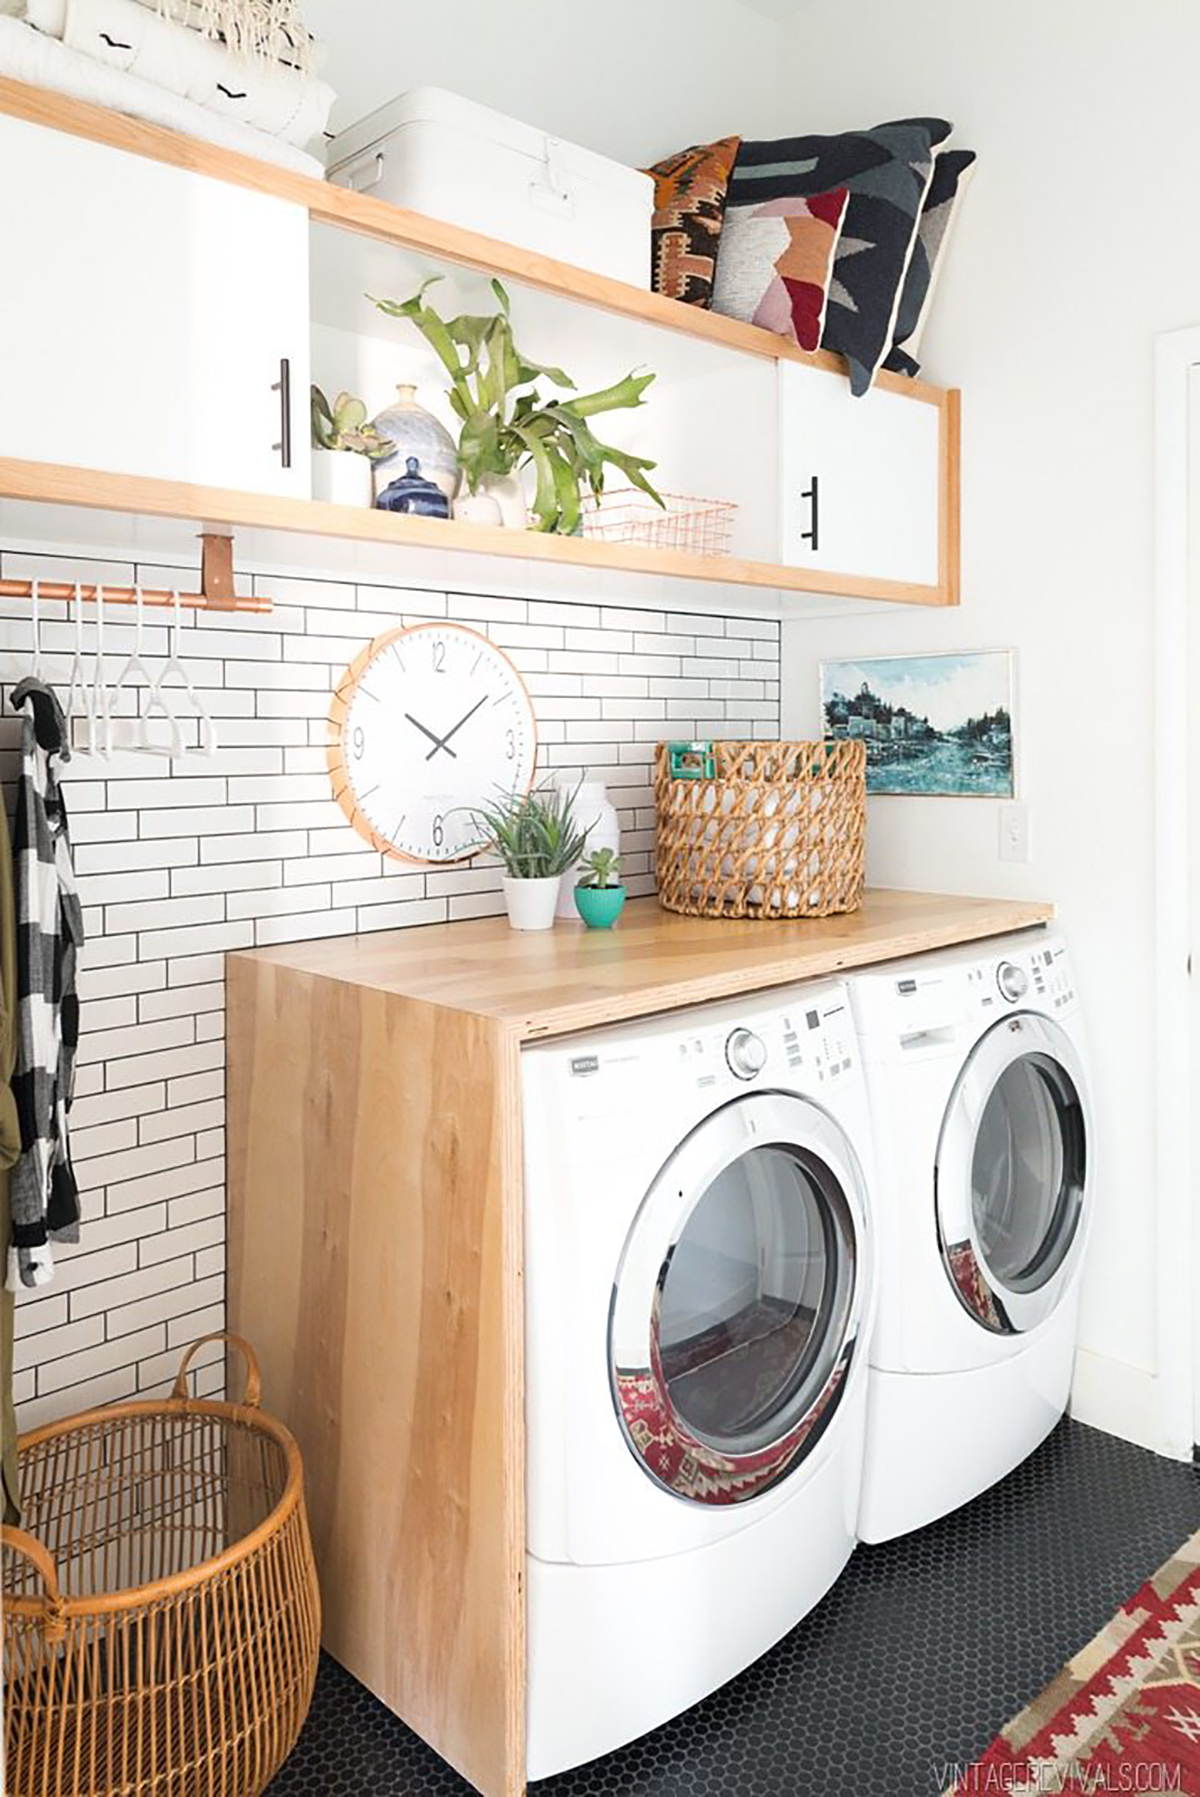 Laundry+Room+Makeover+Vintage+Revivals+11.jpg